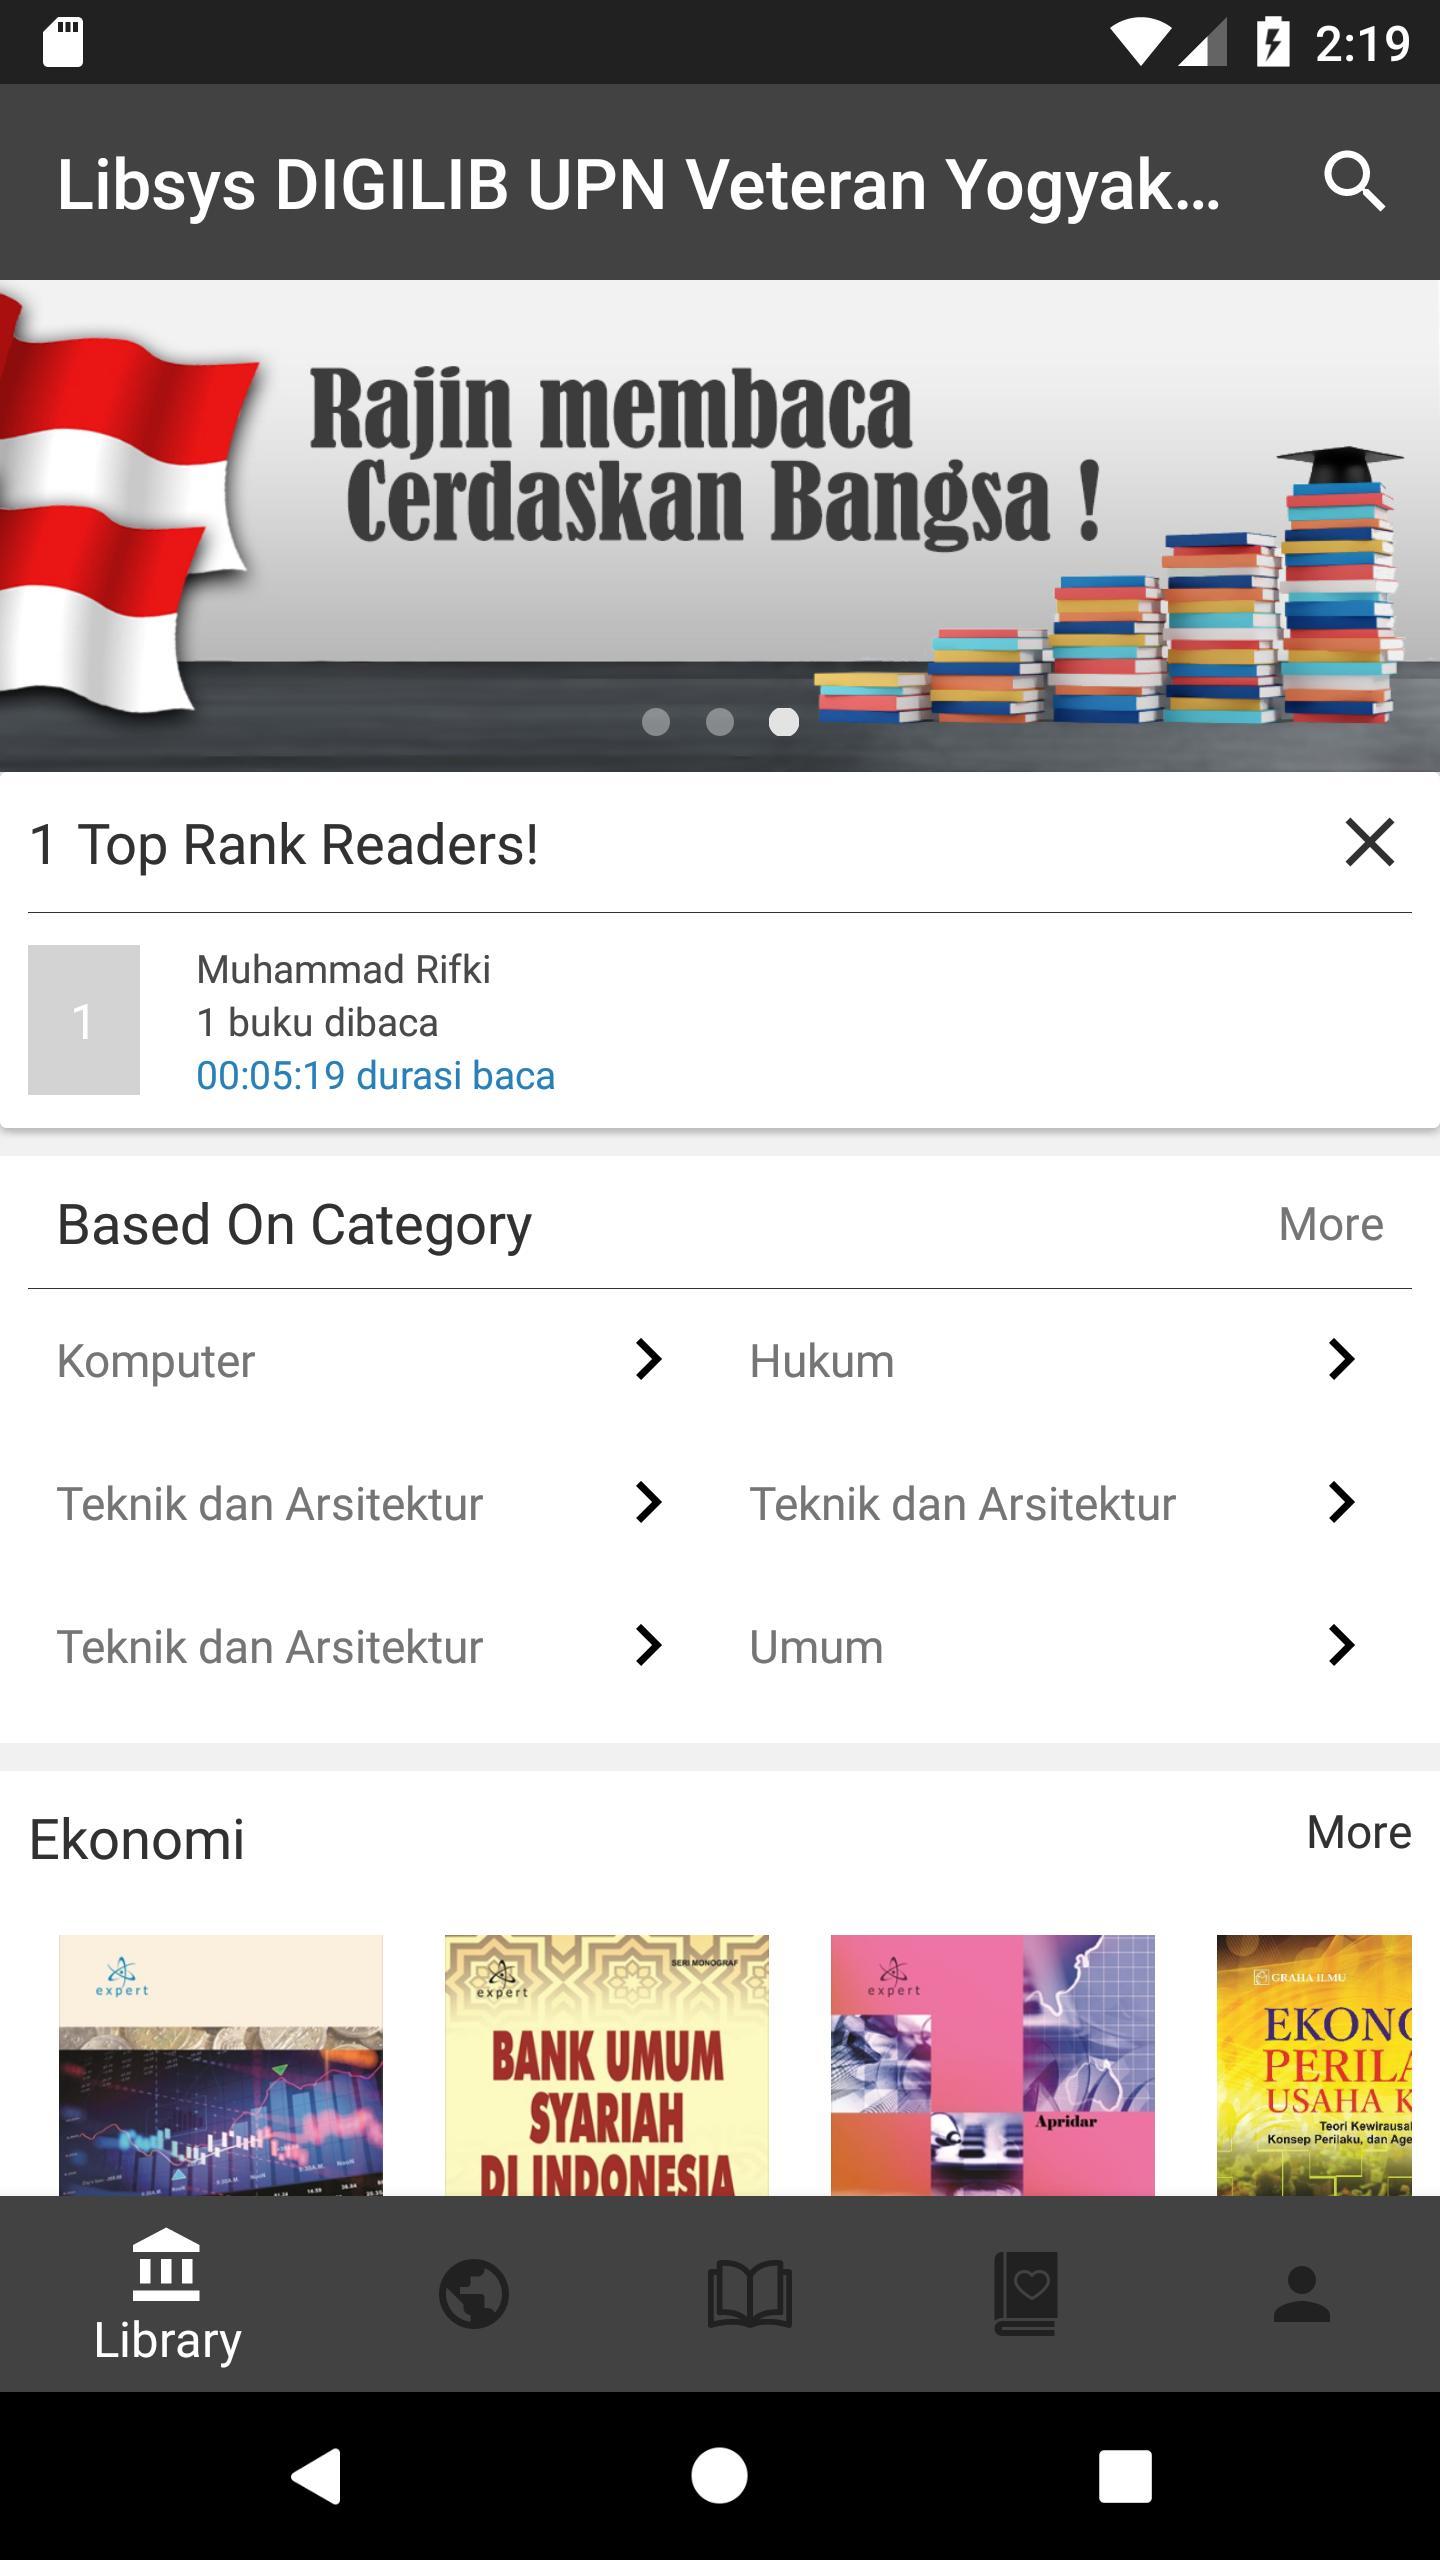 Libsys Digilib Upn Veteran Yogyakarta For Android Apk Download